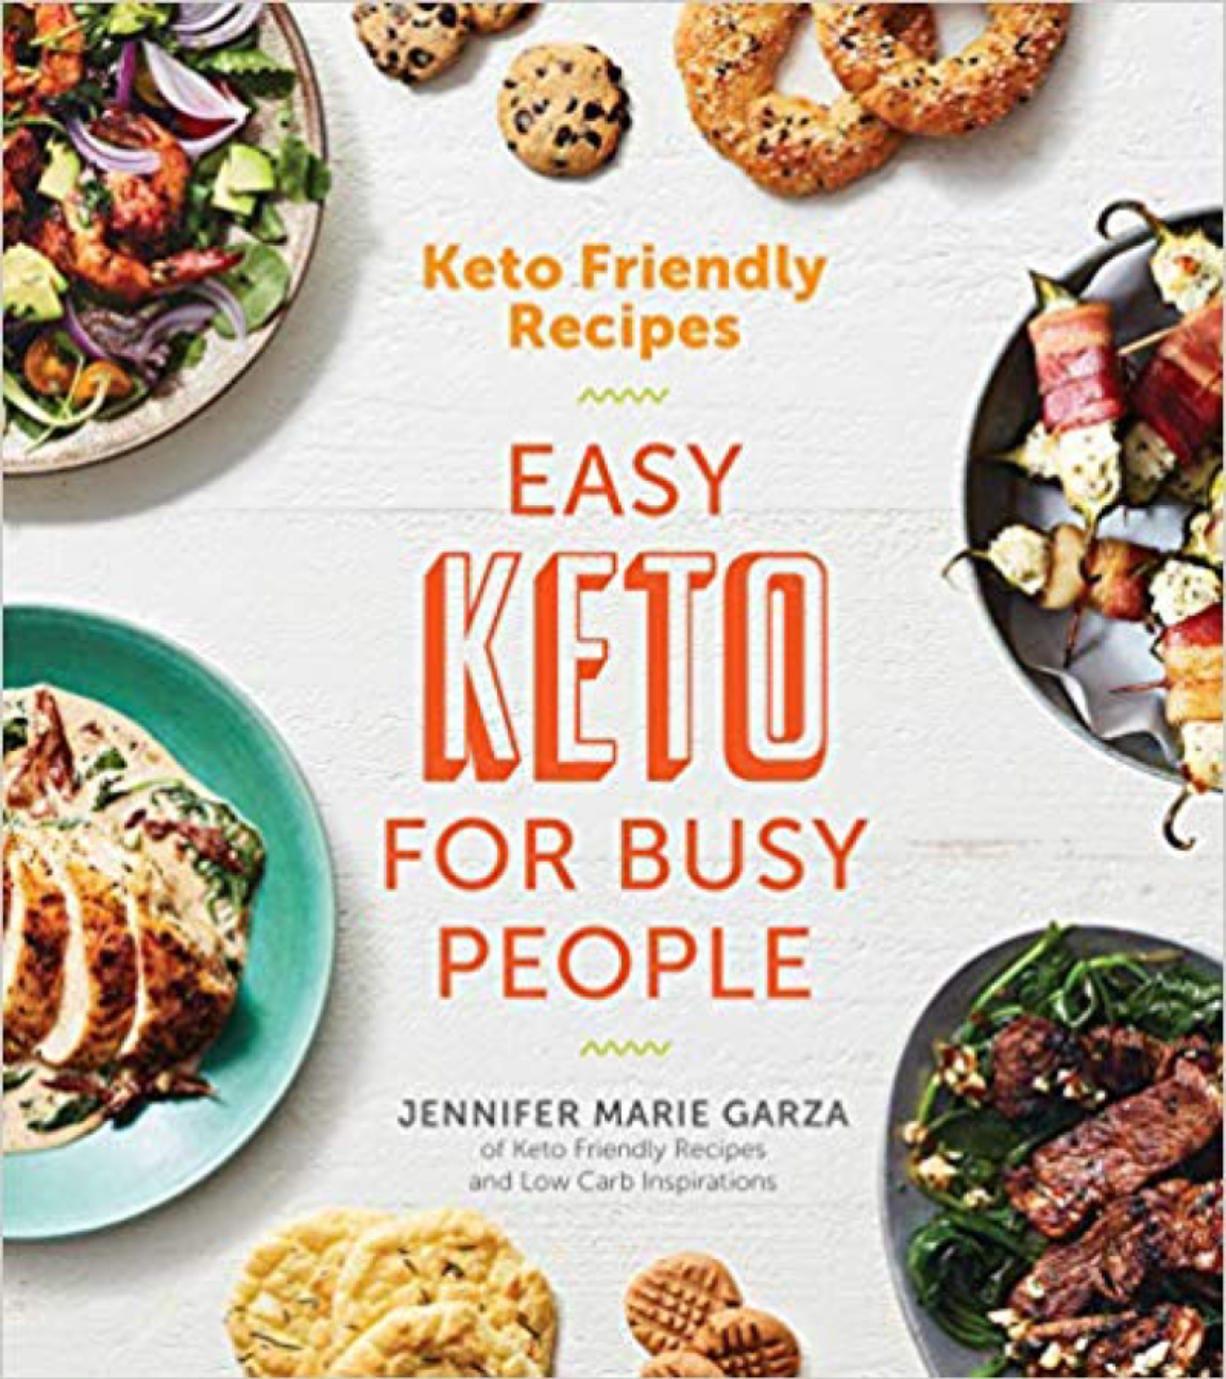 'Keto Friendly Recipes: Easy Keto for Busy People' by Jennifer Marie Garza (Houghton Mifflin Harcourt/TNS)